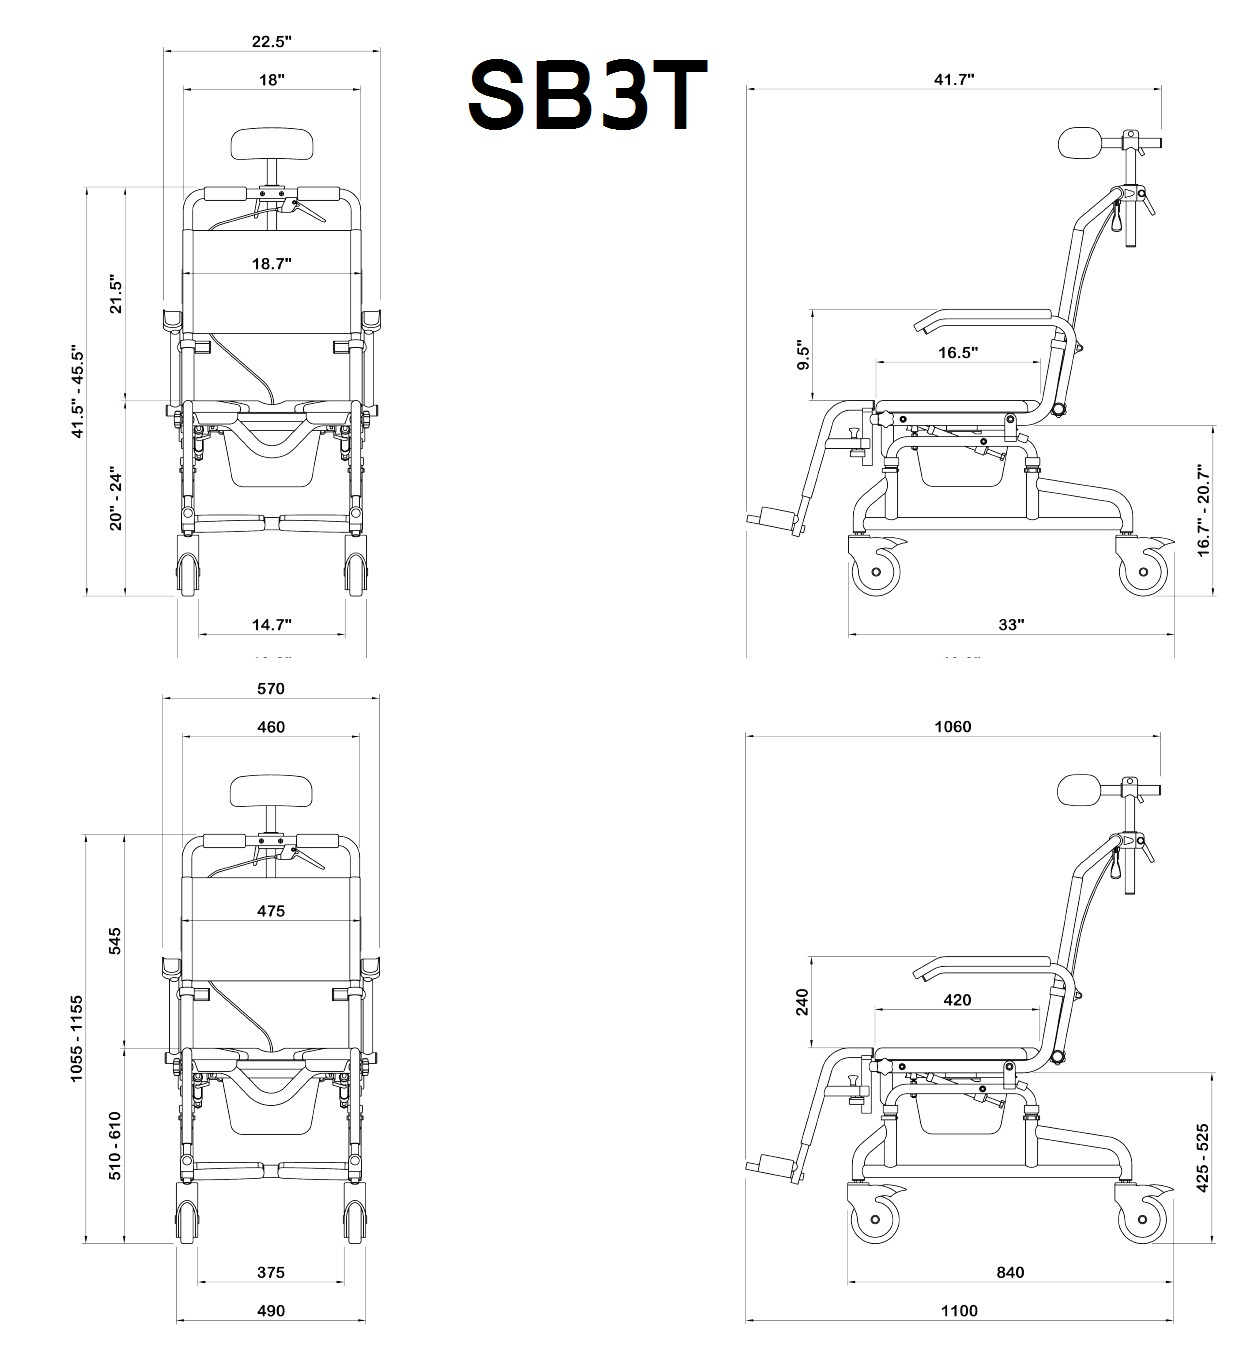 sb3t-diagram-2010.jpg